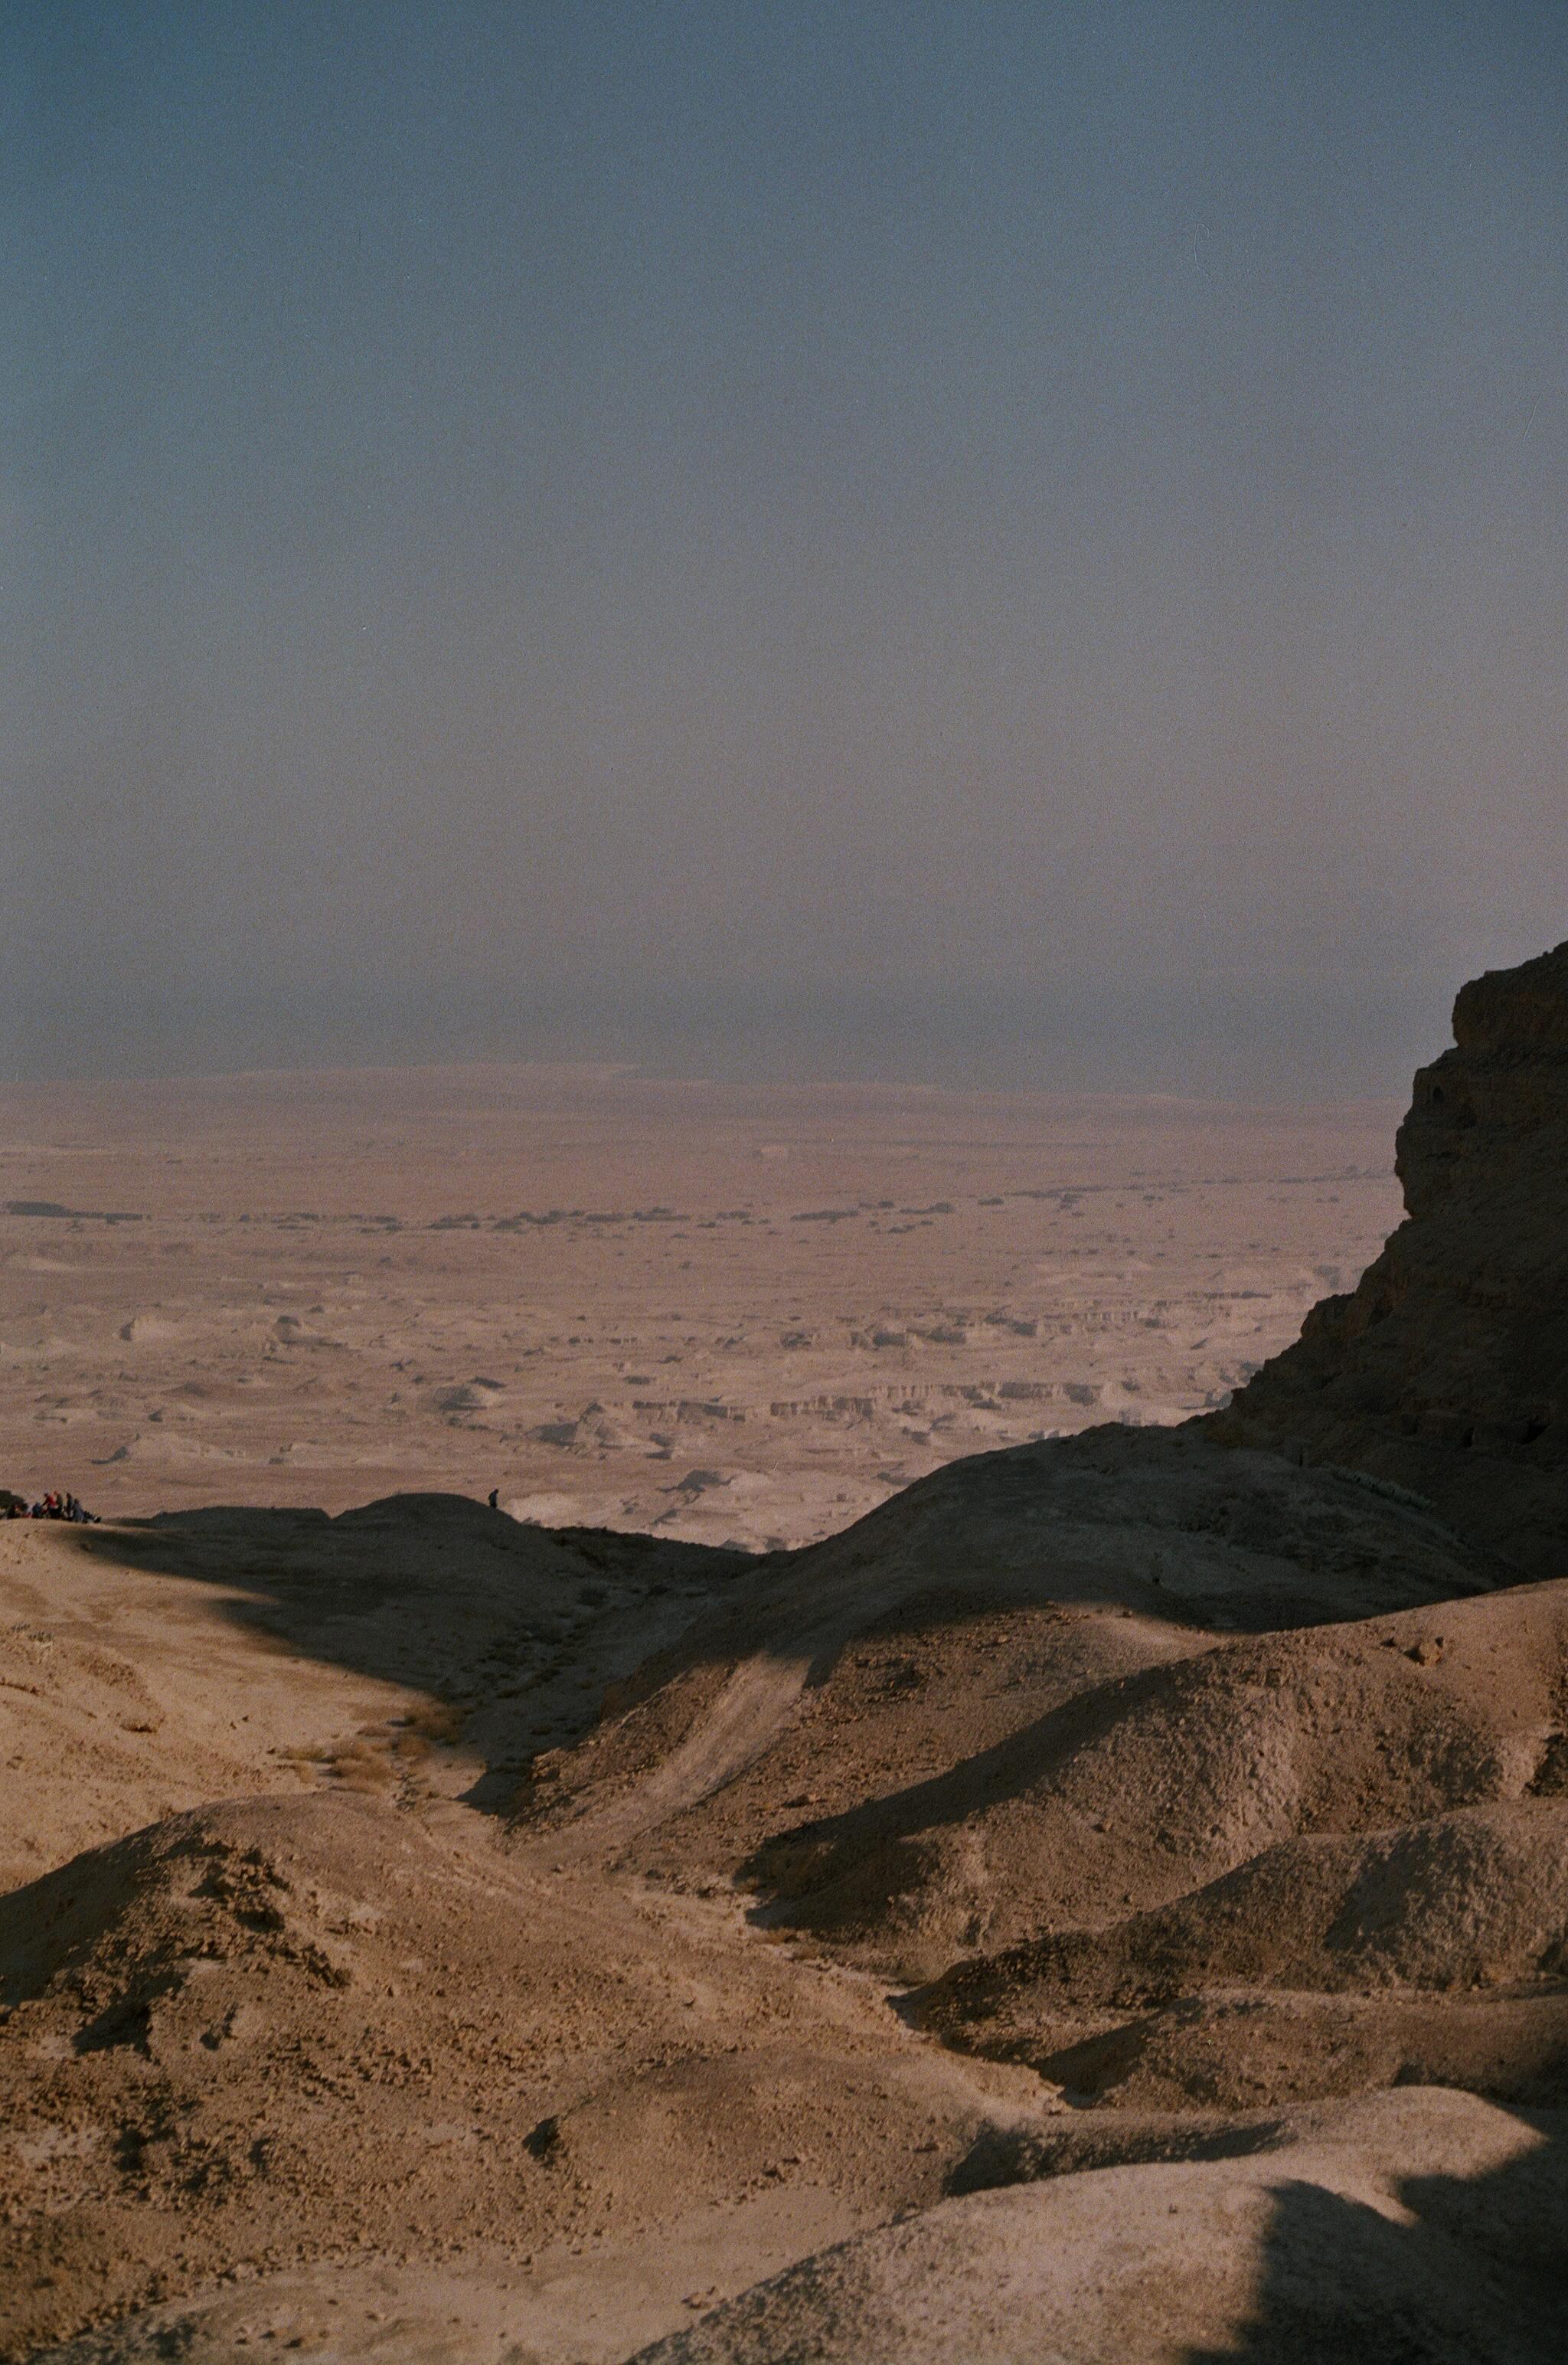 Portrait of the dunes that lie beneath Masada